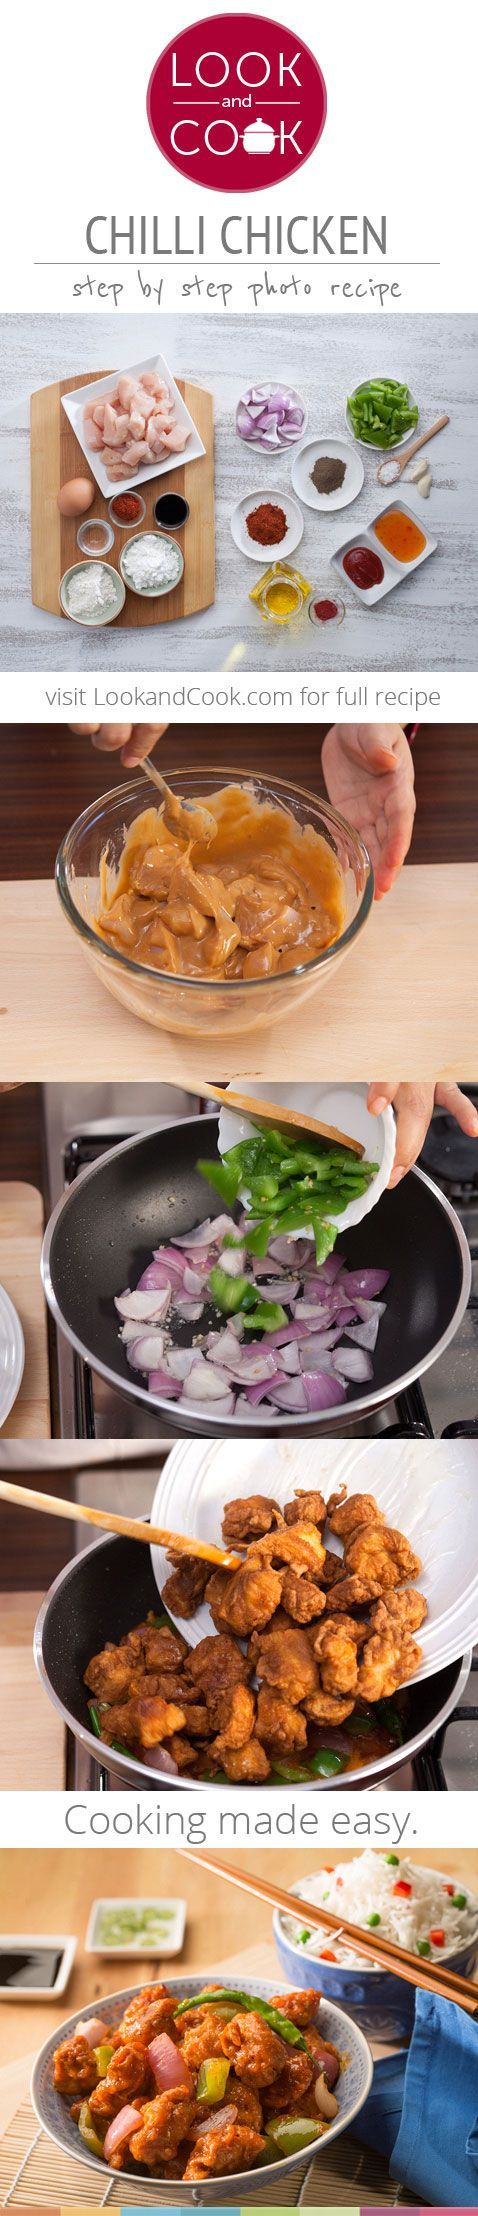 How to make chilli chicken recipe chilli chicken recipe recipes chilli chicken recipe chilli chickenlc1417 forumfinder Images